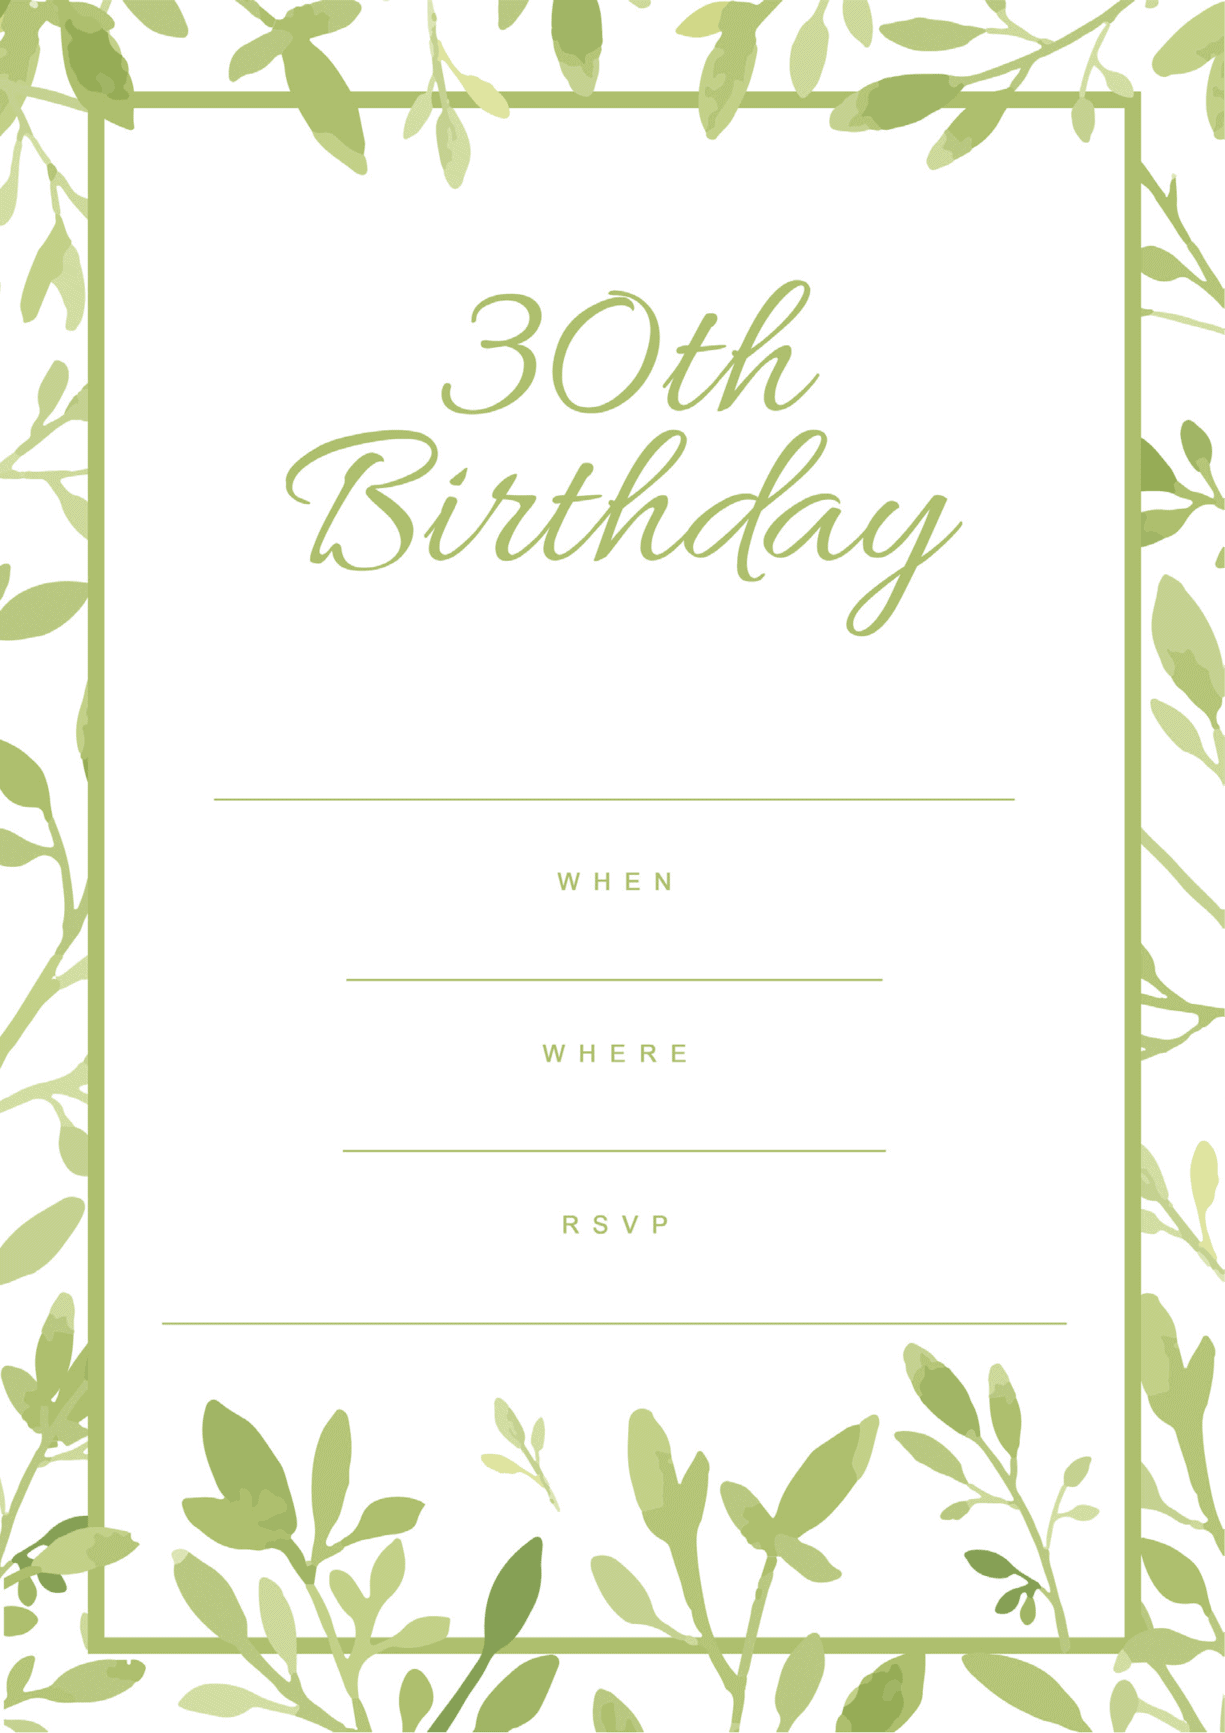 30th birthday invitation green white design